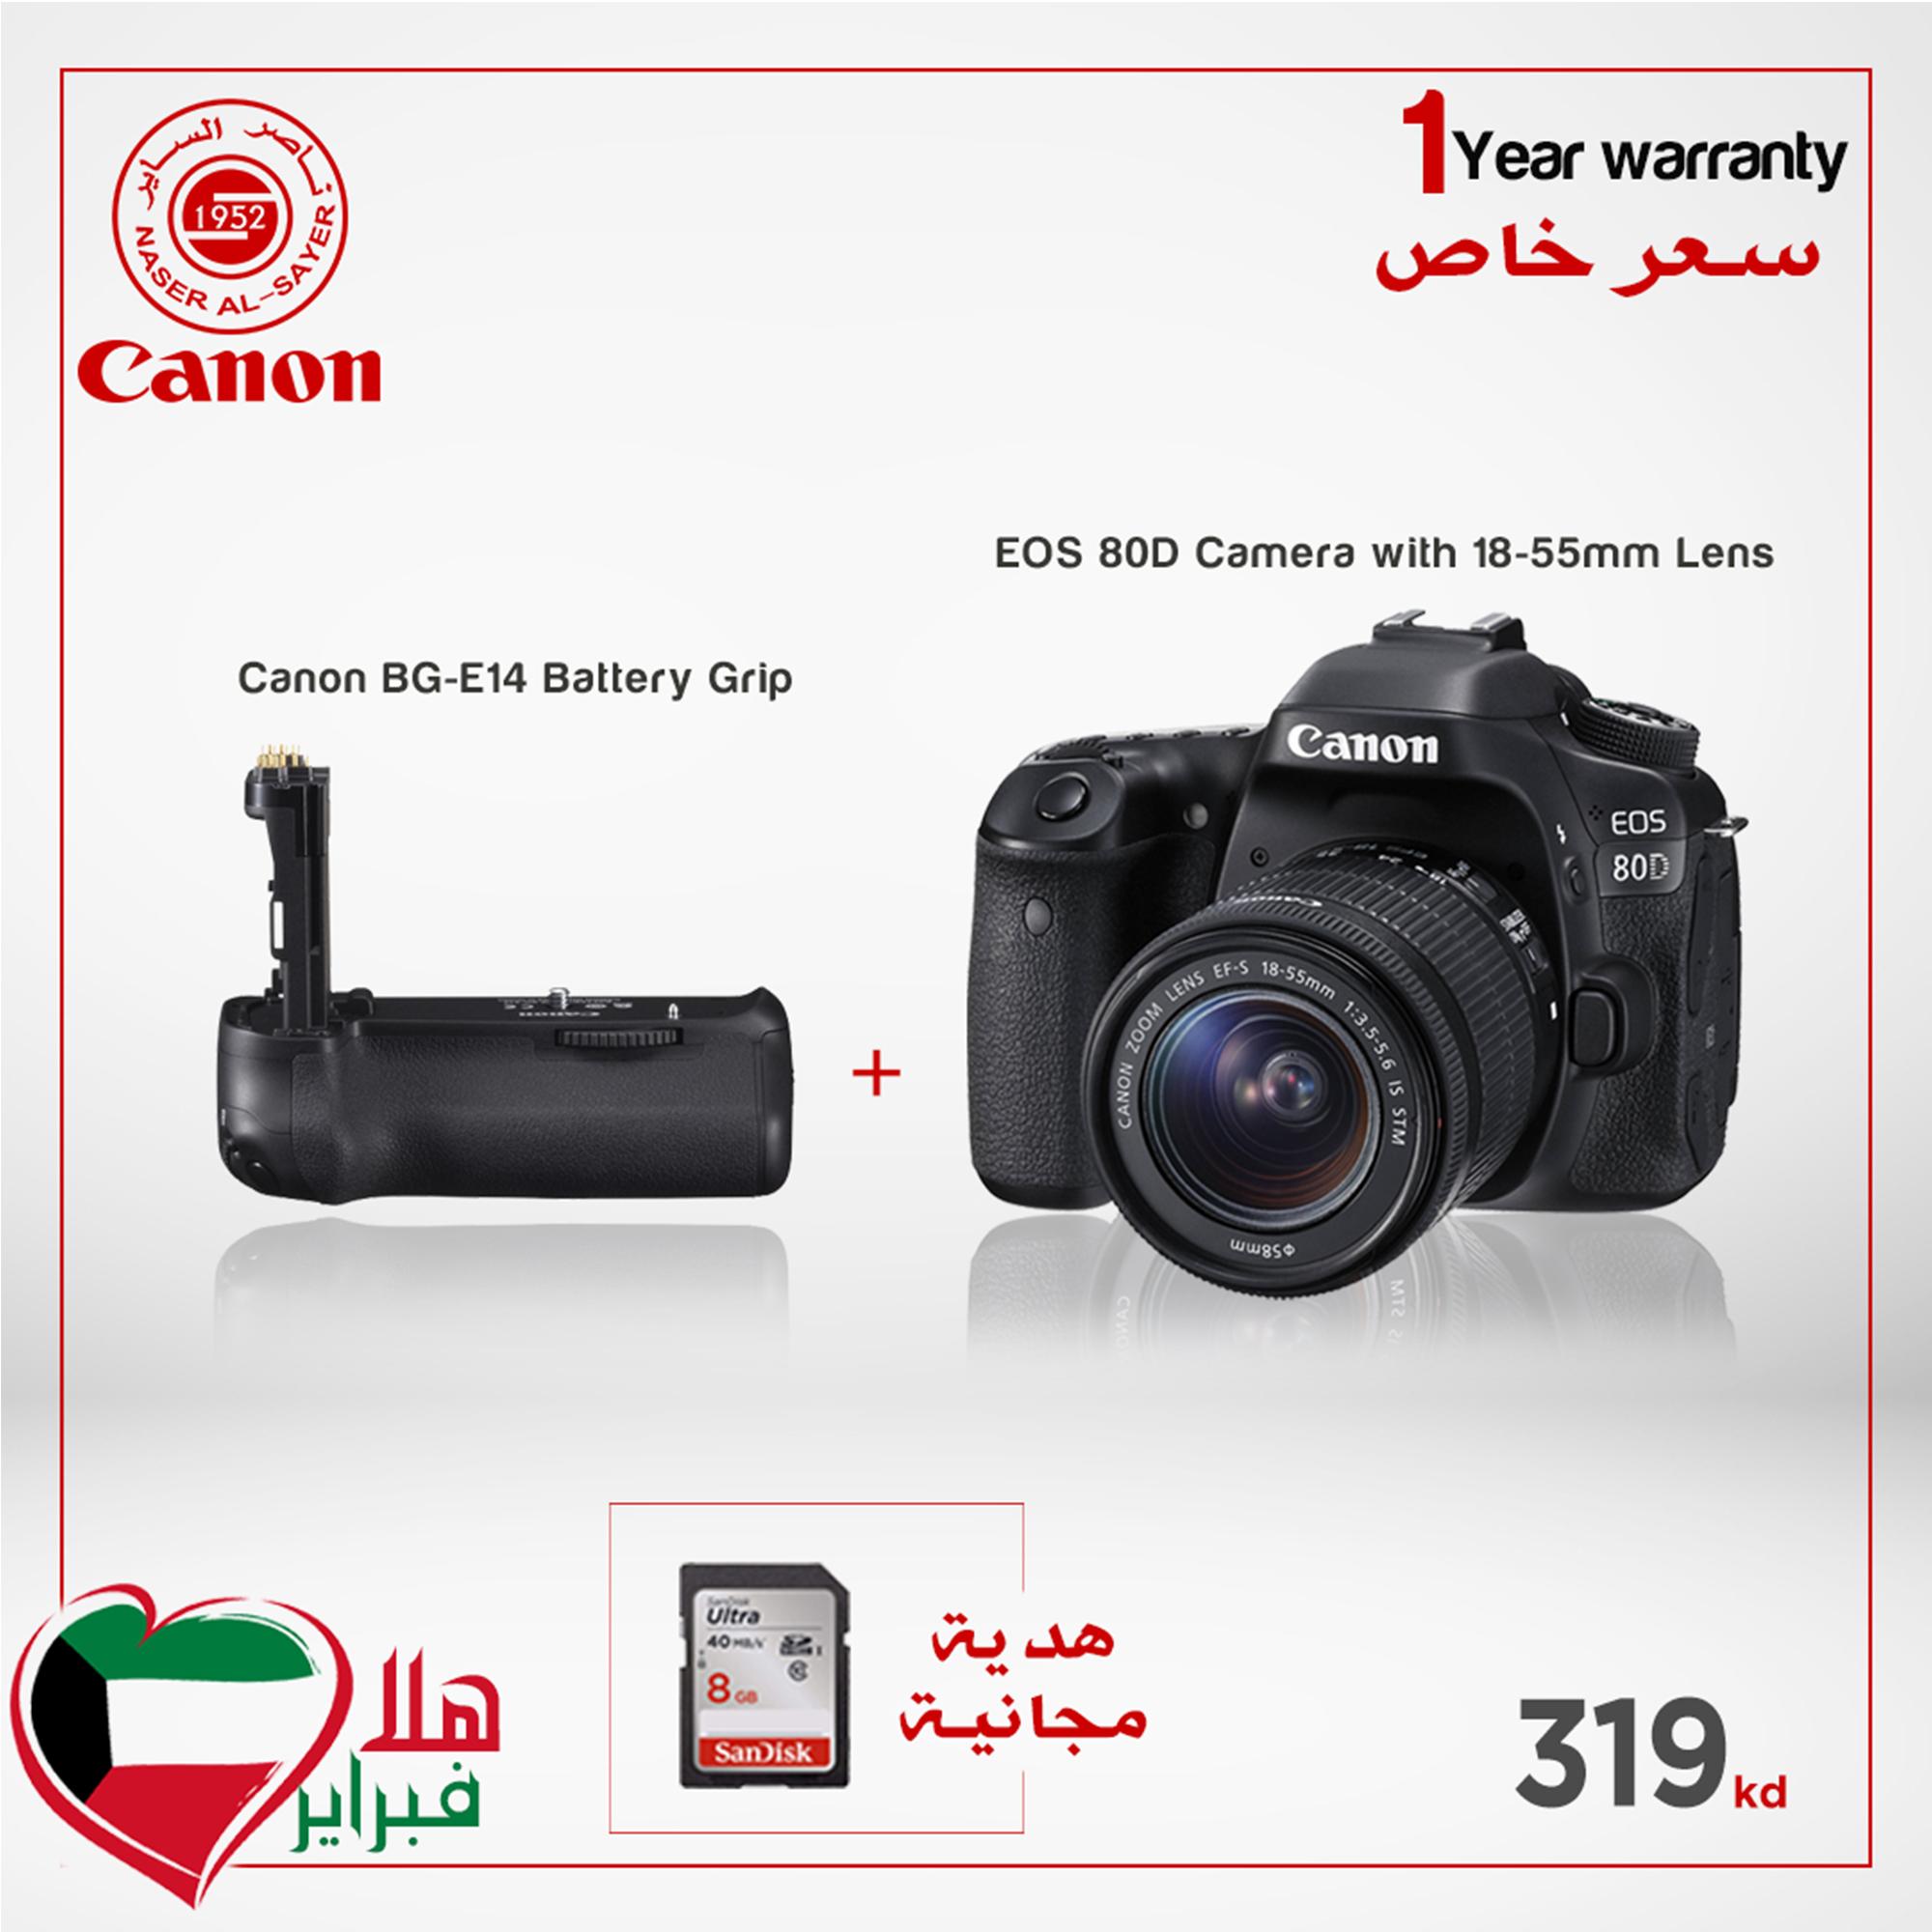 EOS 80D Camera with 18-55mm Lens + Canon BG-E14 Battery Grip